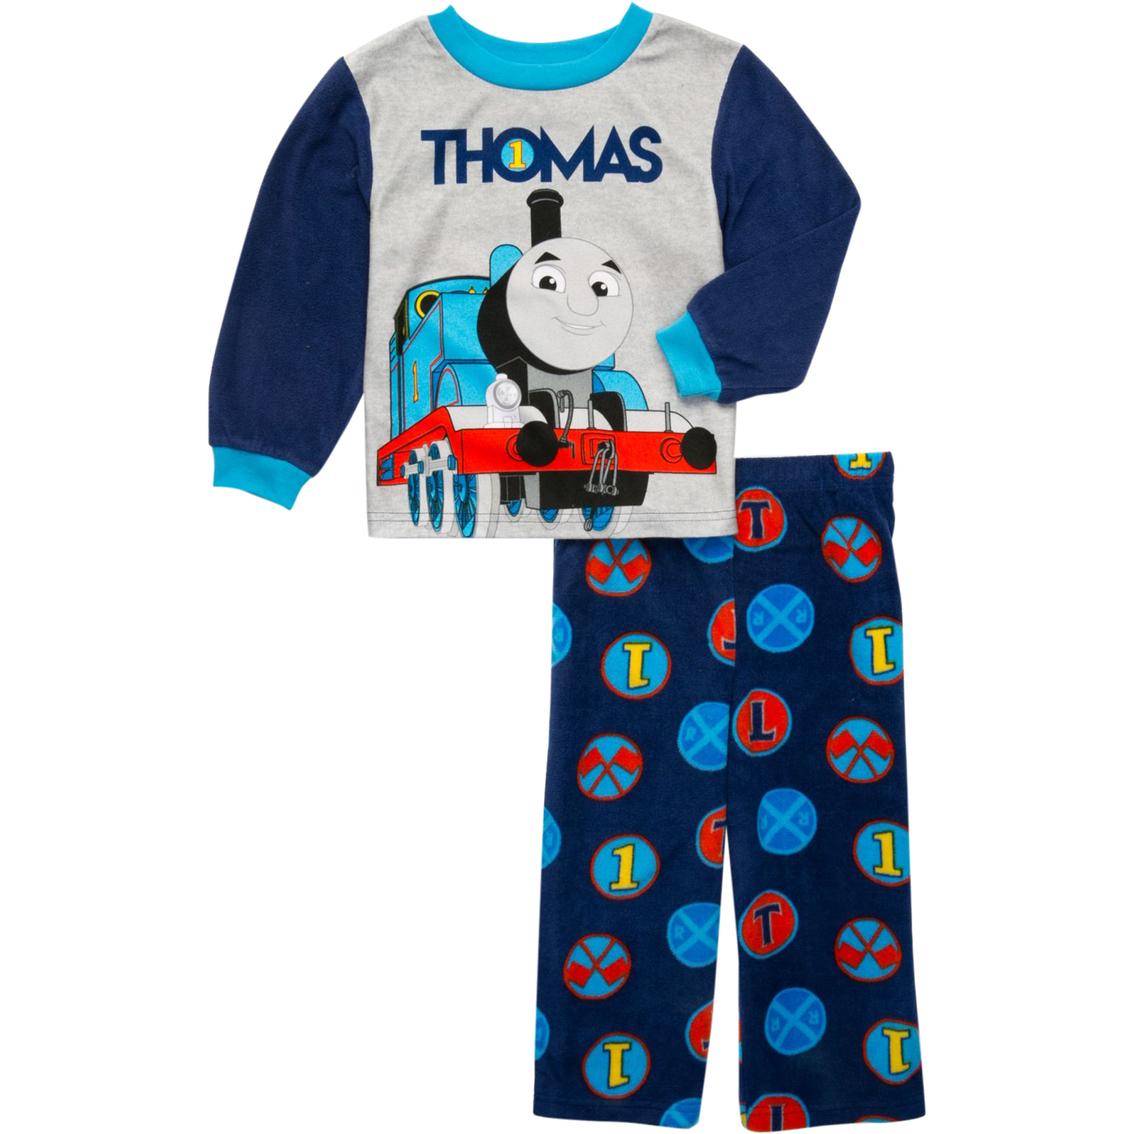 Thomas /& Friends Toddler Boys 2-Piece Pajama Set Size 2T 3T 4T $36